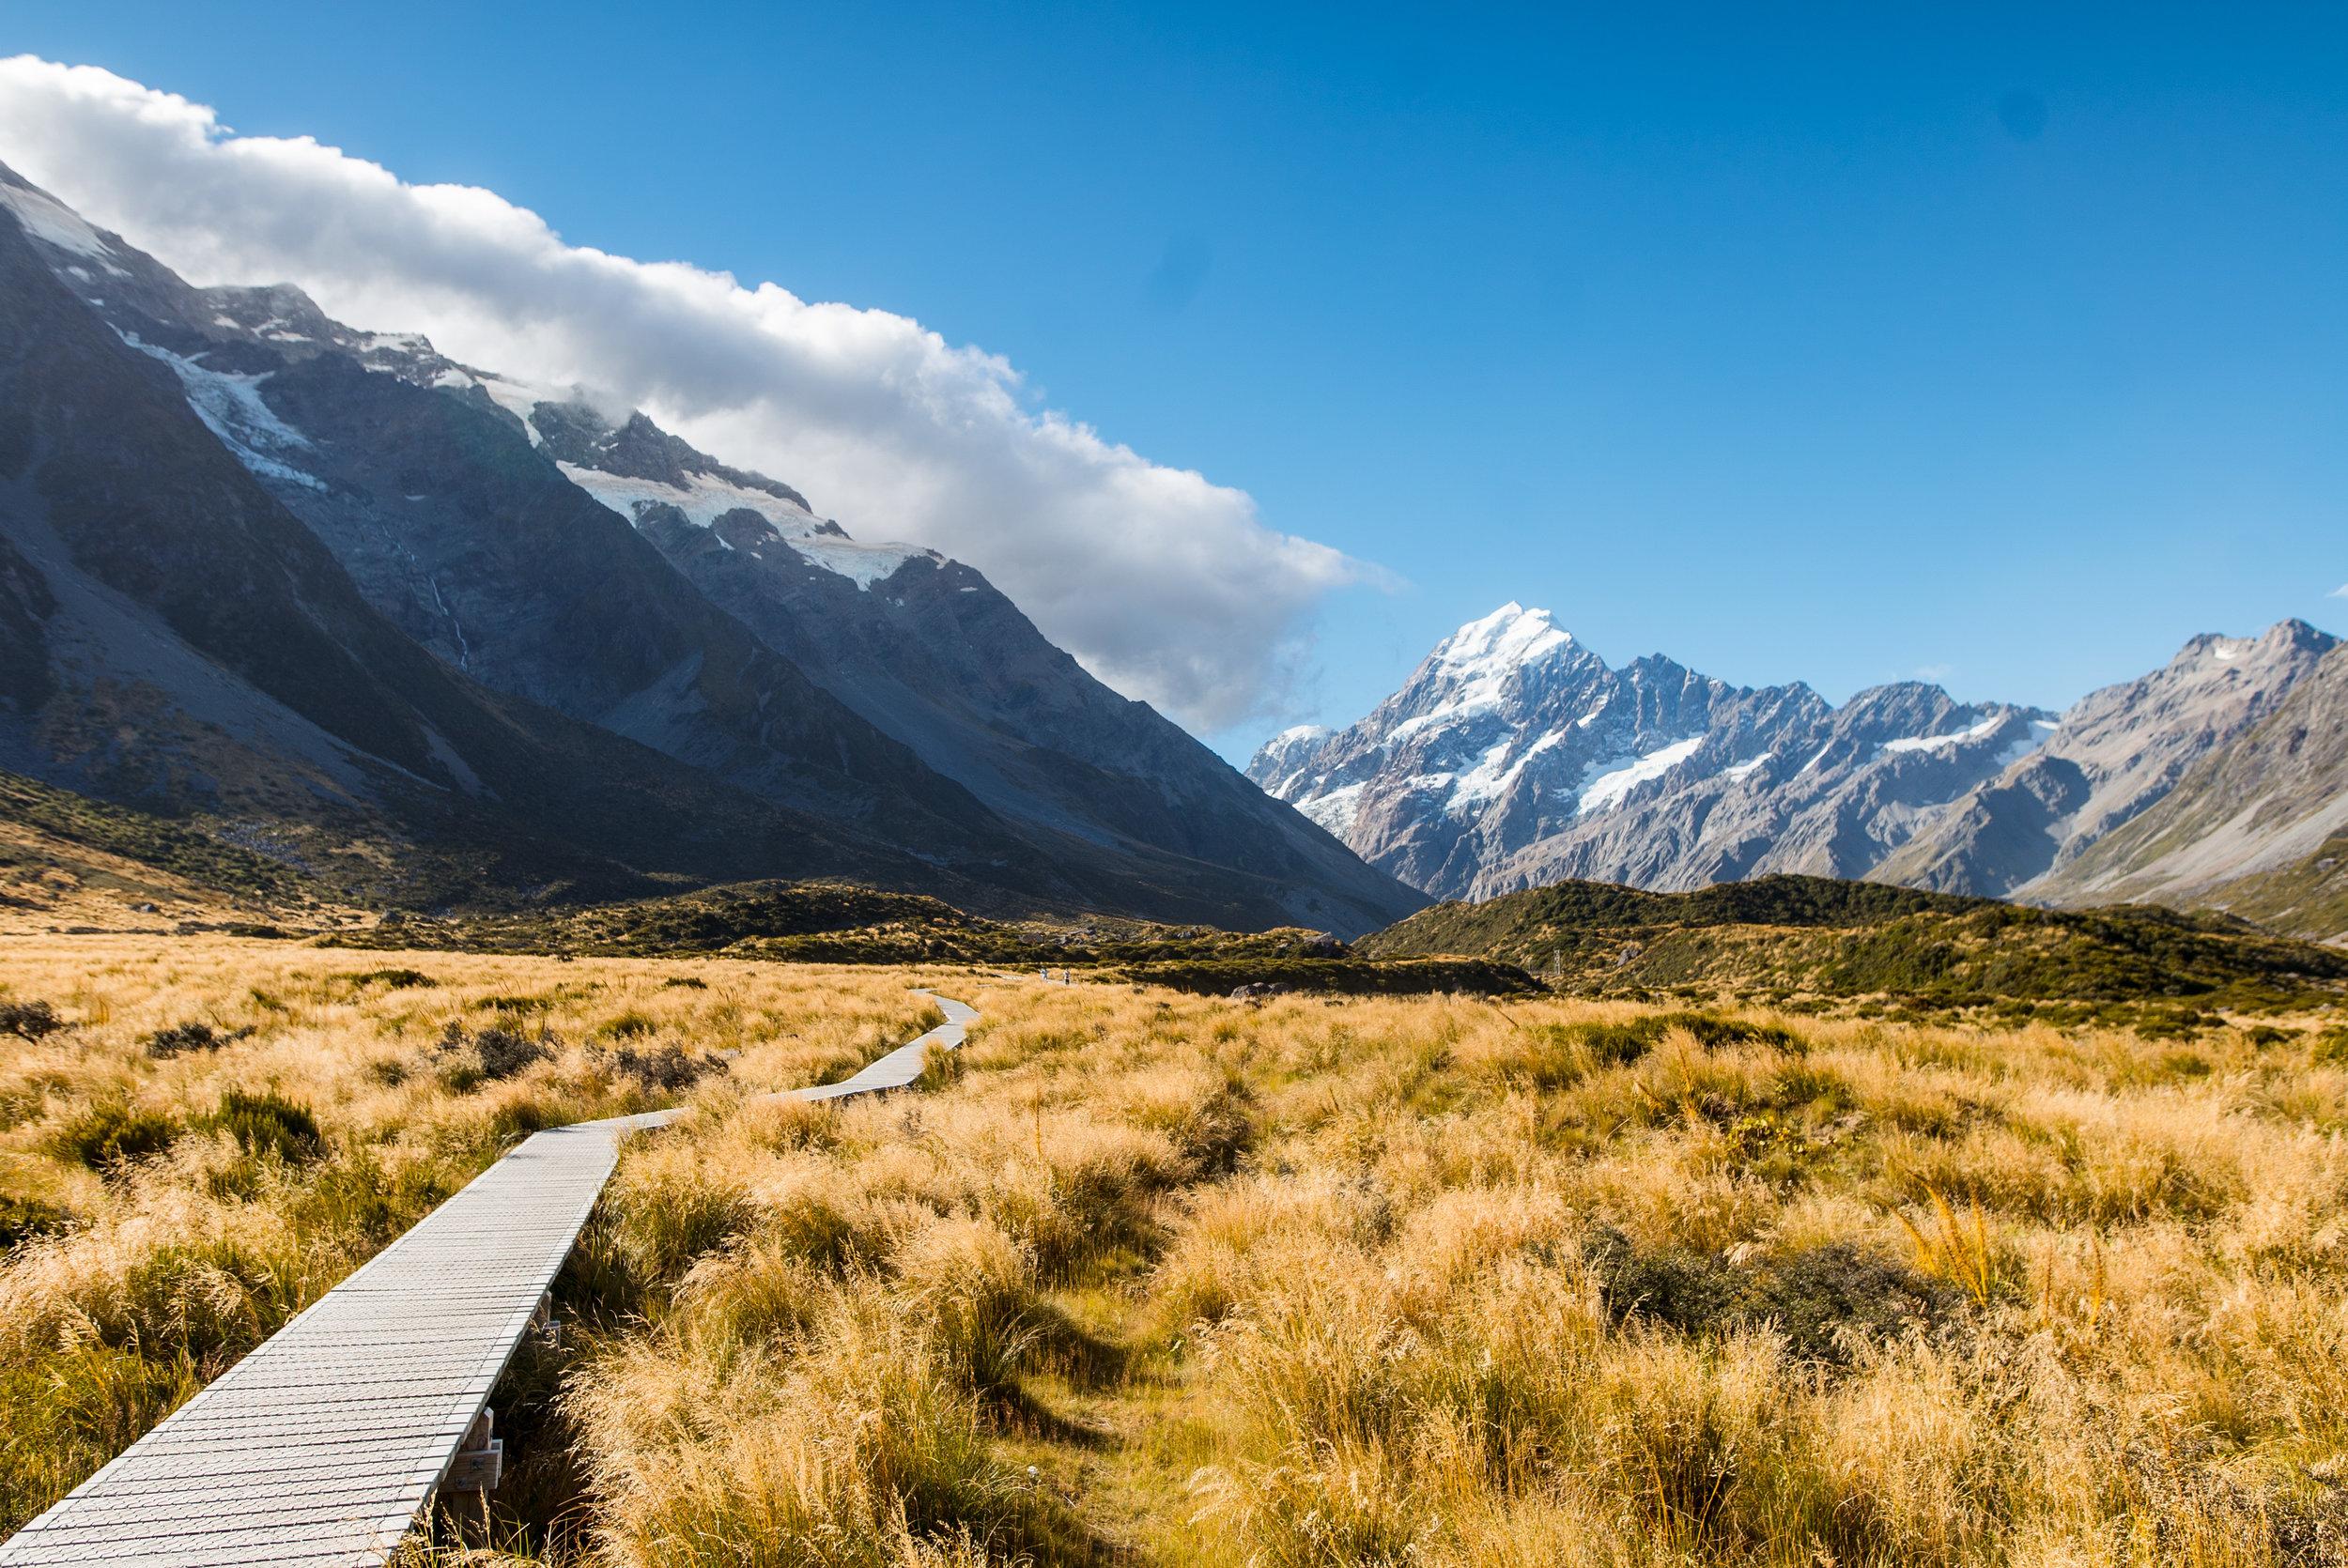 newzealand-00900.jpg